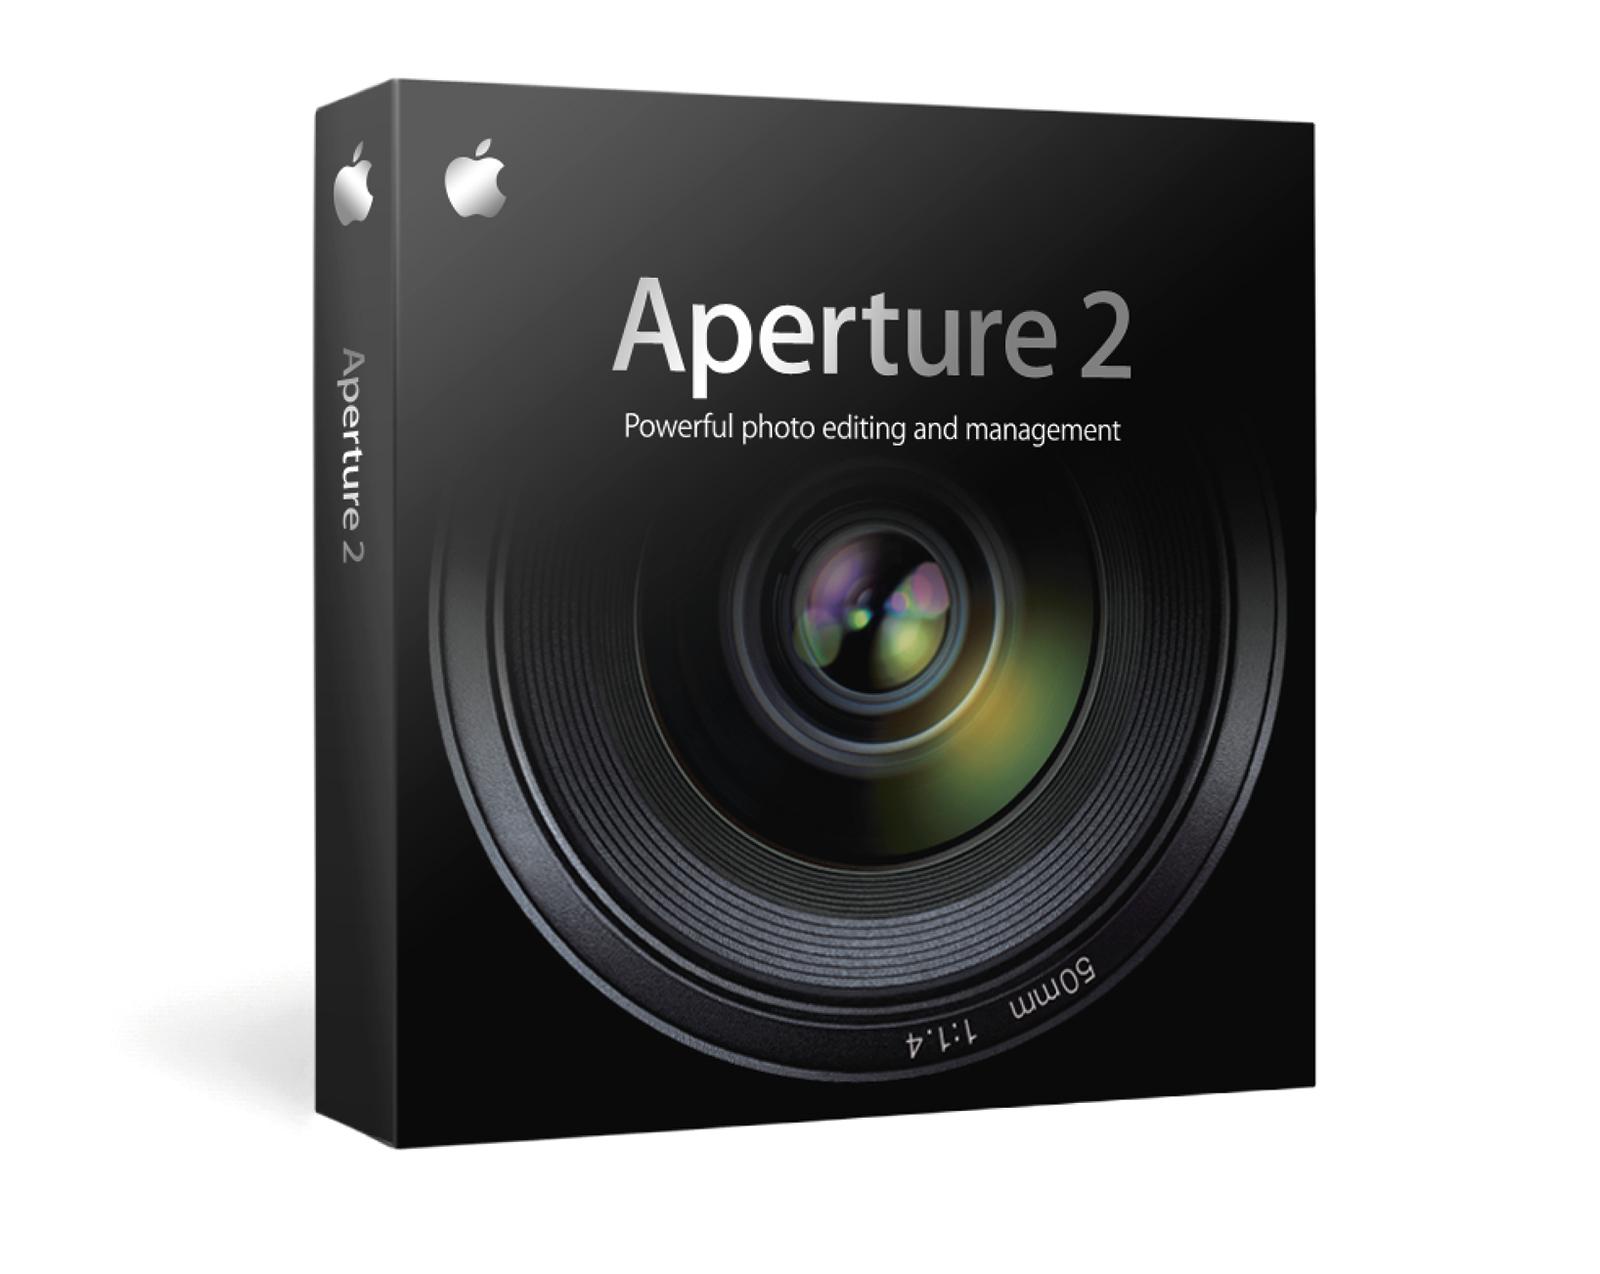 aperture2_box